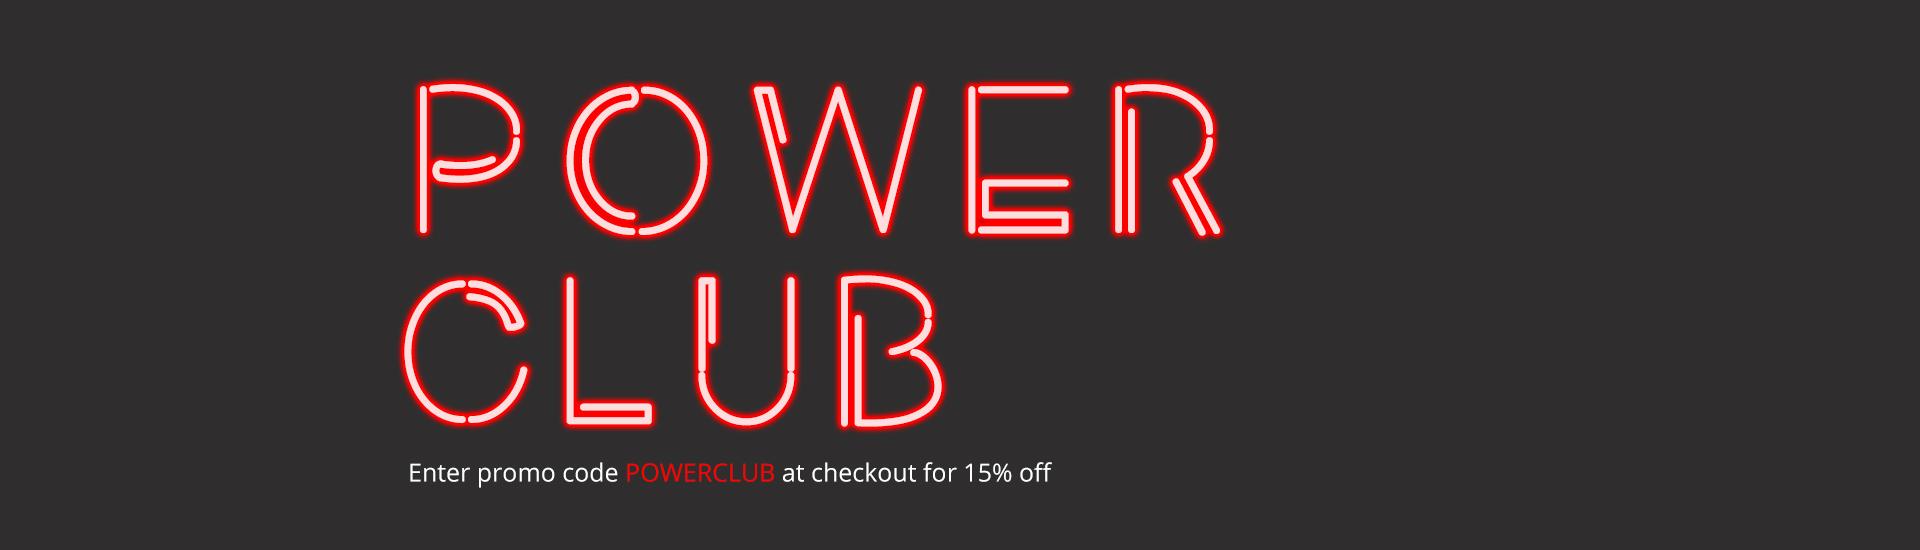 powerclub-landing4.jpg